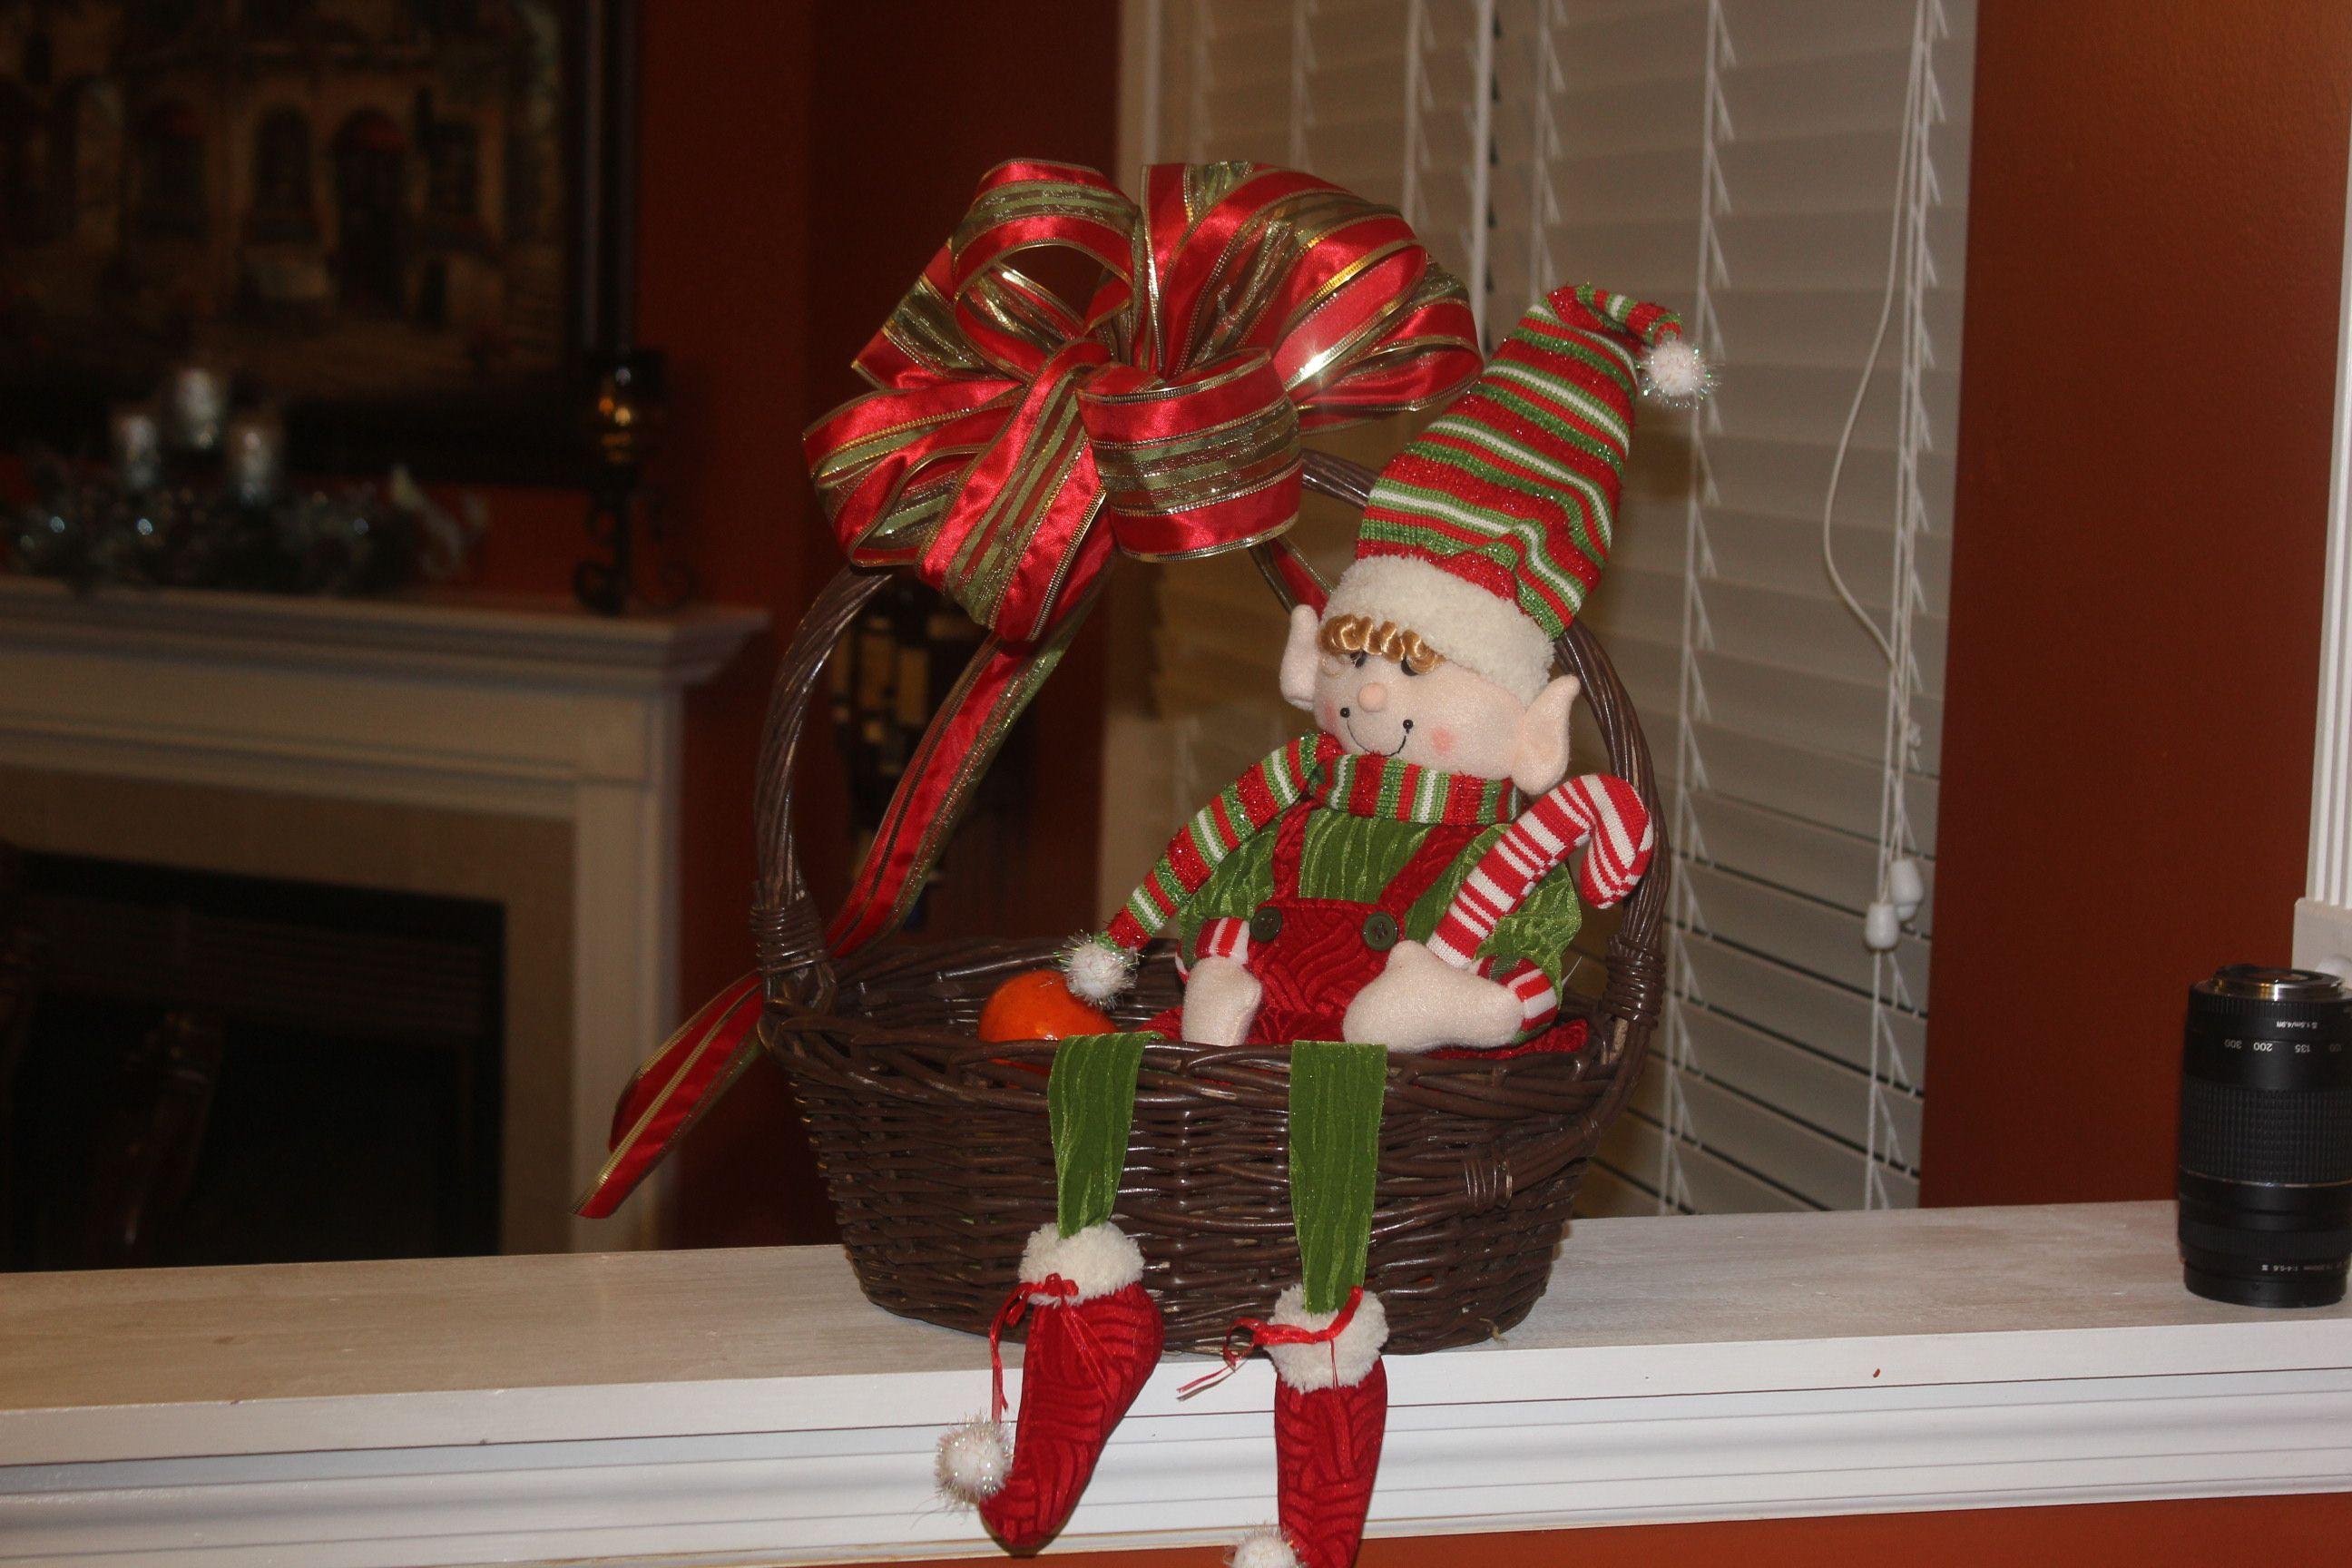 Elf in Basket